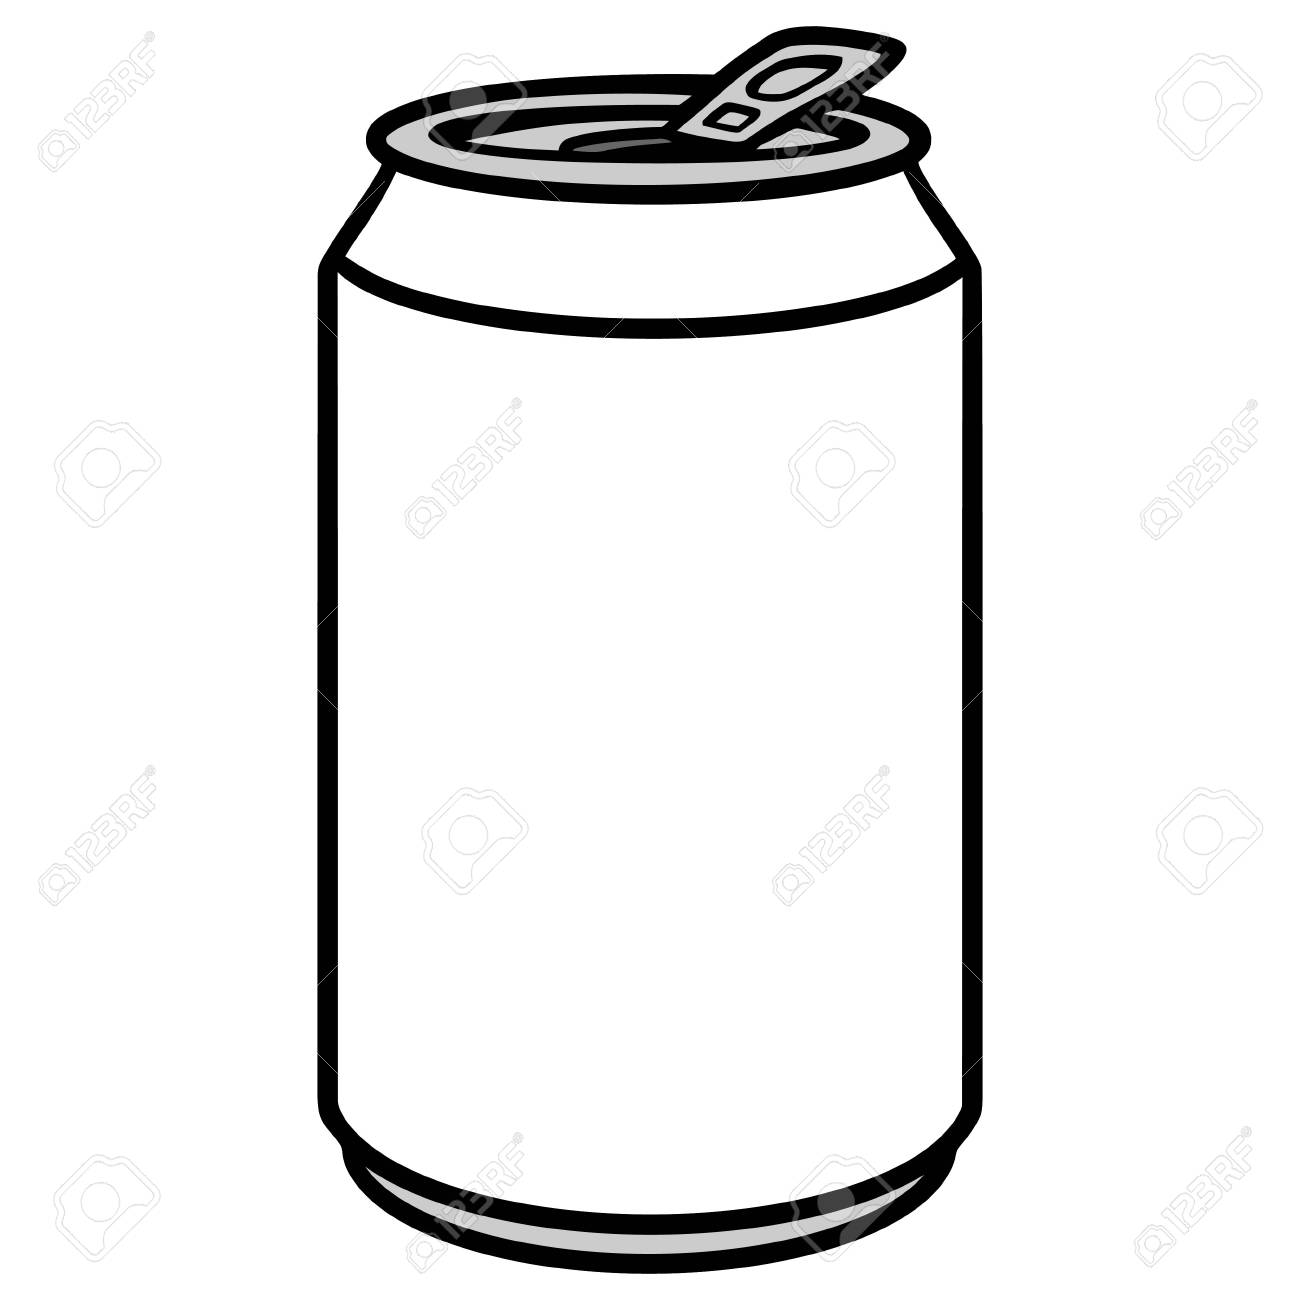 Soda Can Illustration.